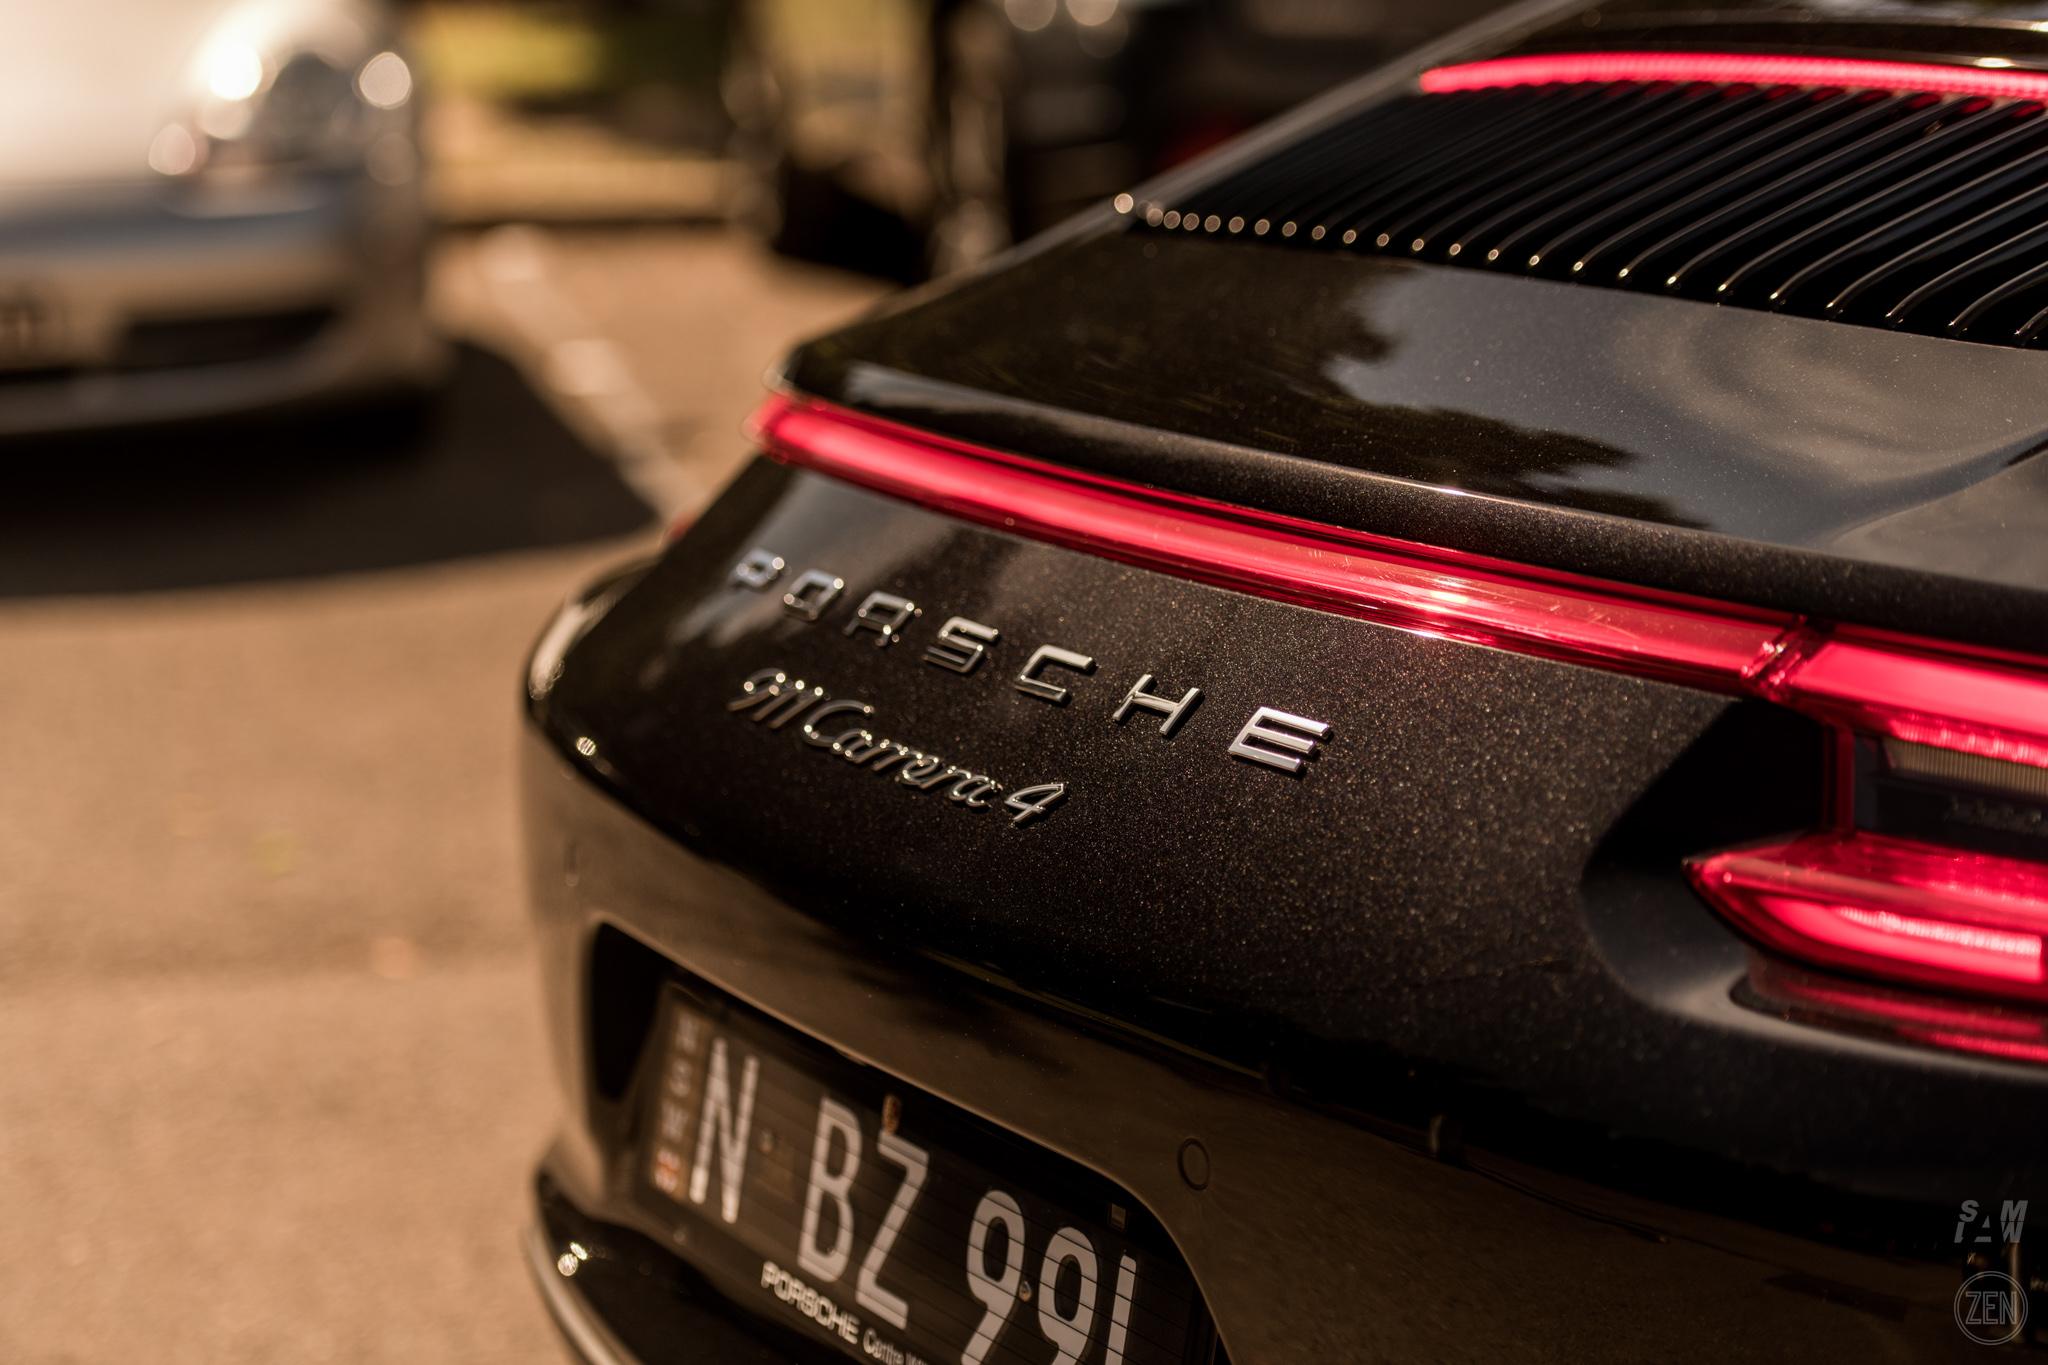 2019-10-27 - Autohaus Porsches & Coffee 172